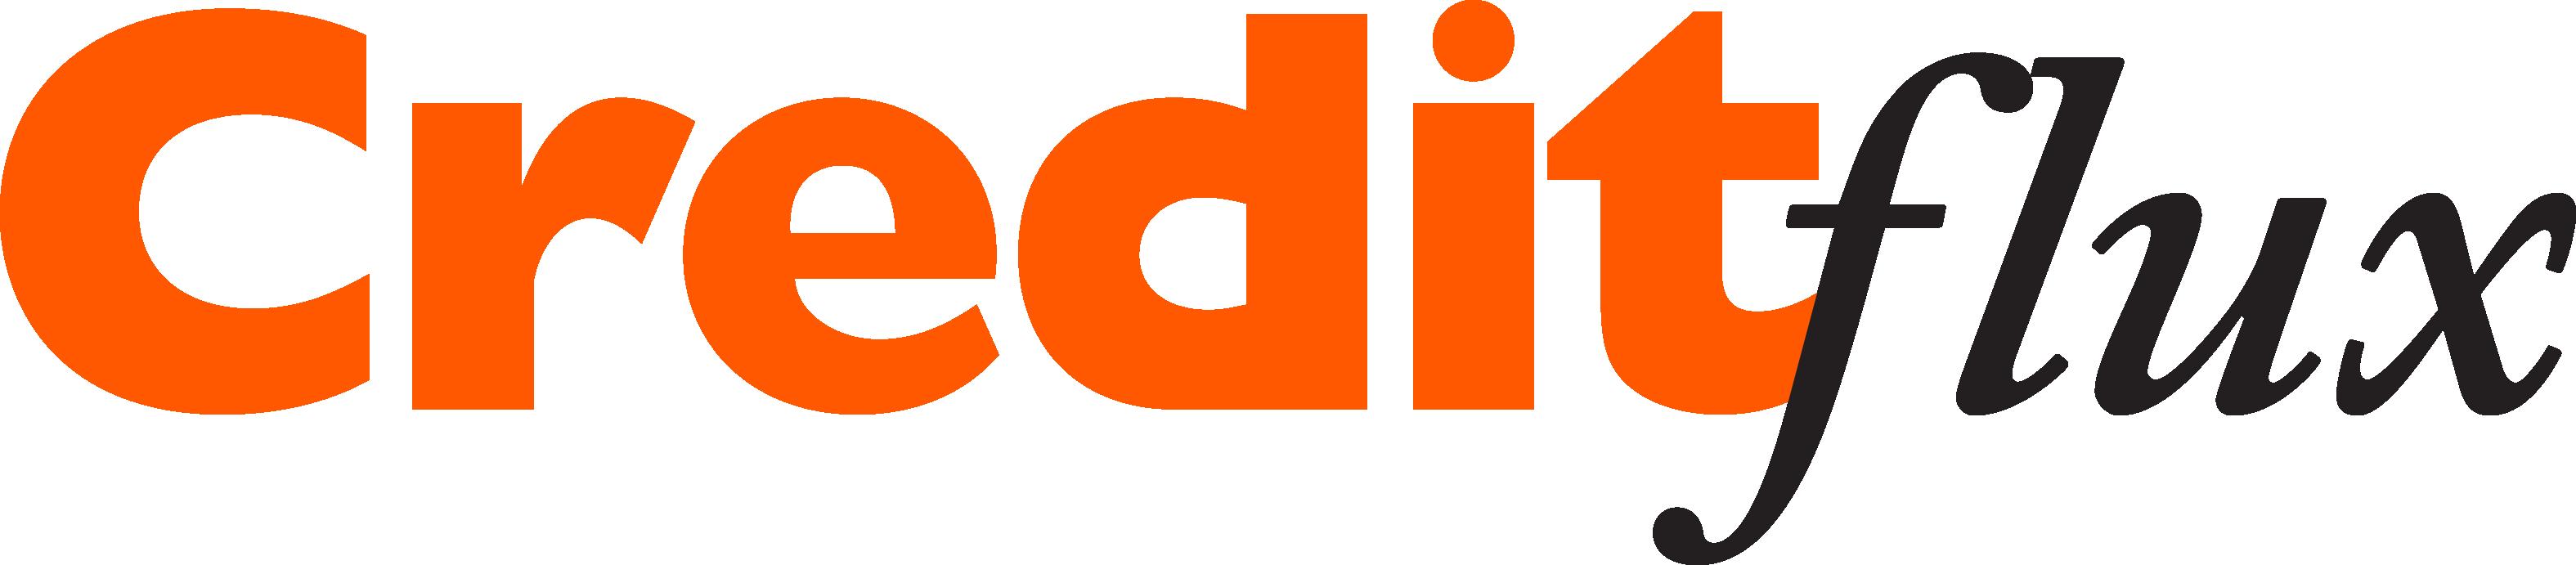 Creditflux logo